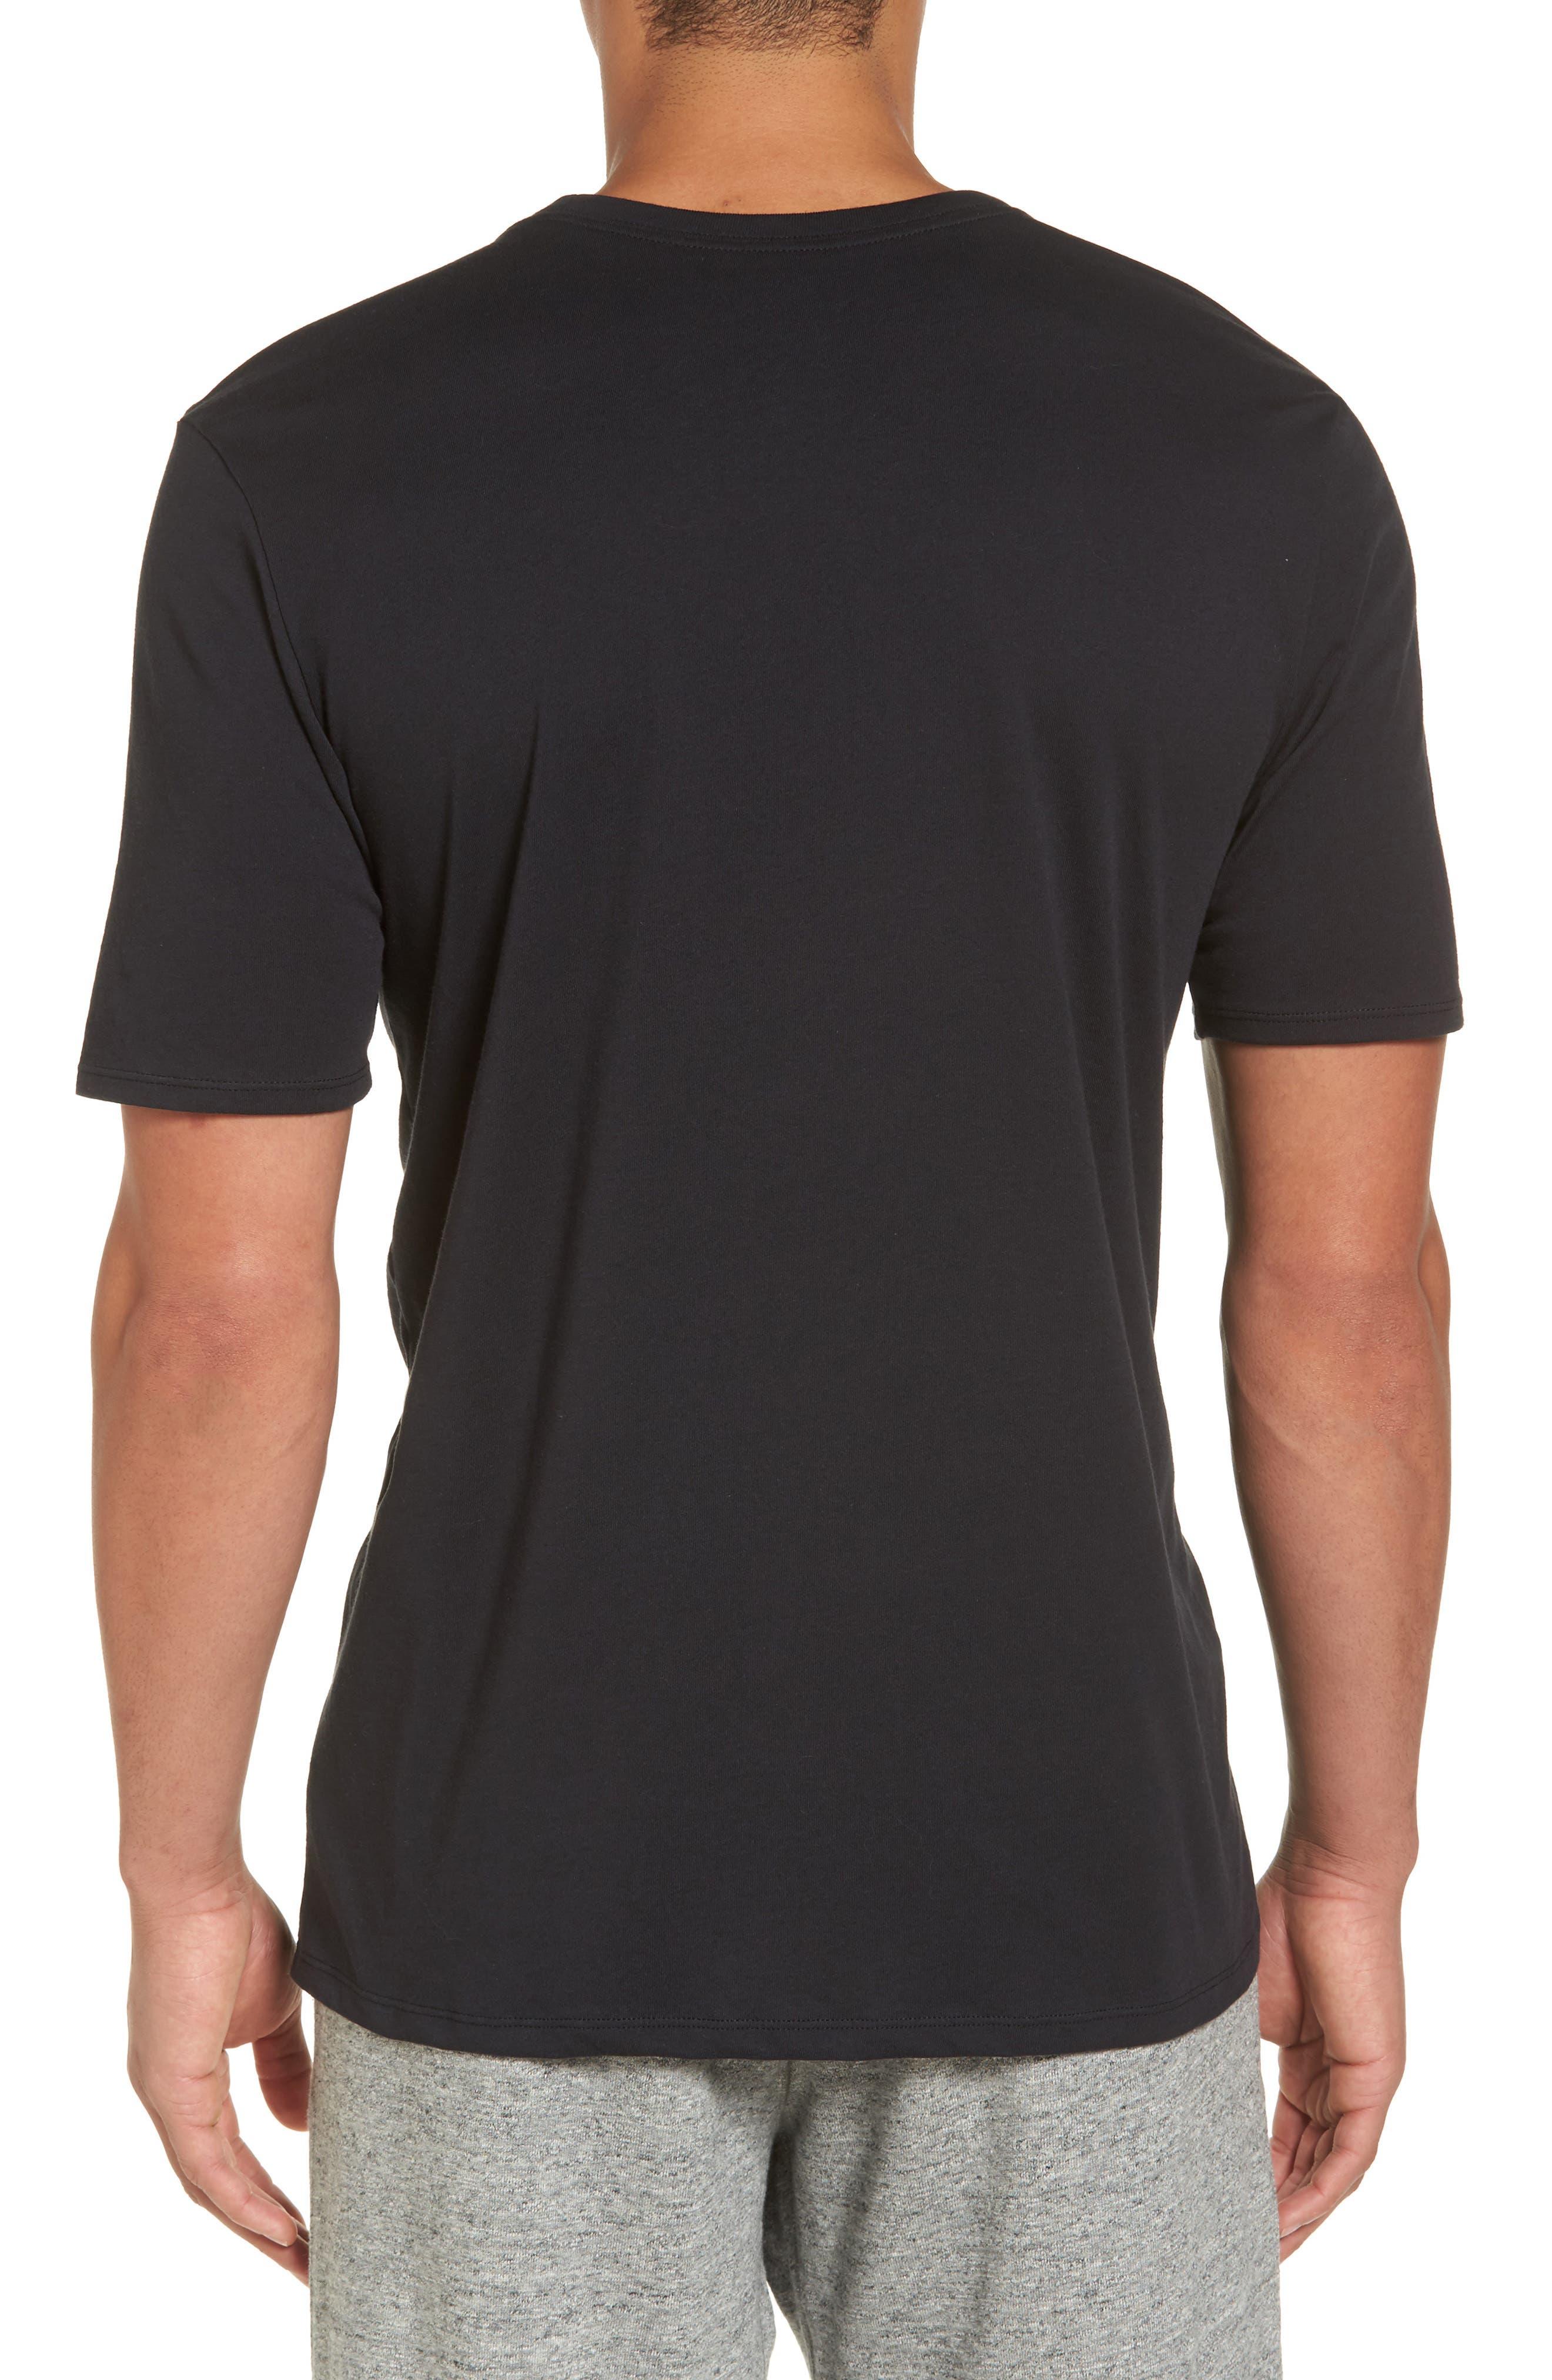 Dry No Excuses Training T-Shirt,                             Alternate thumbnail 2, color,                             010